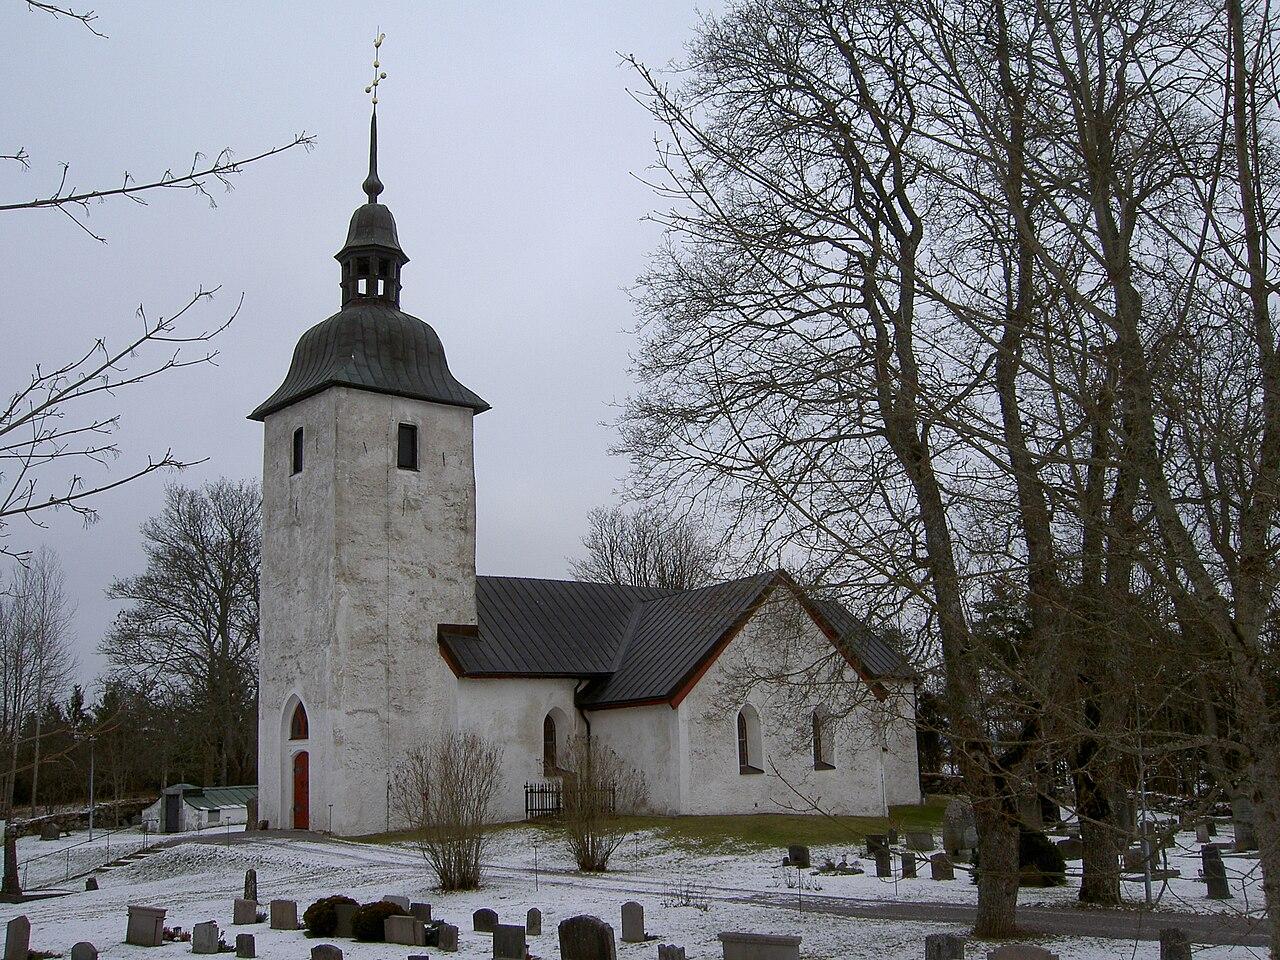 Fil:Ytterjrna kyrka - KMB - patient-survey.net Wikipedia